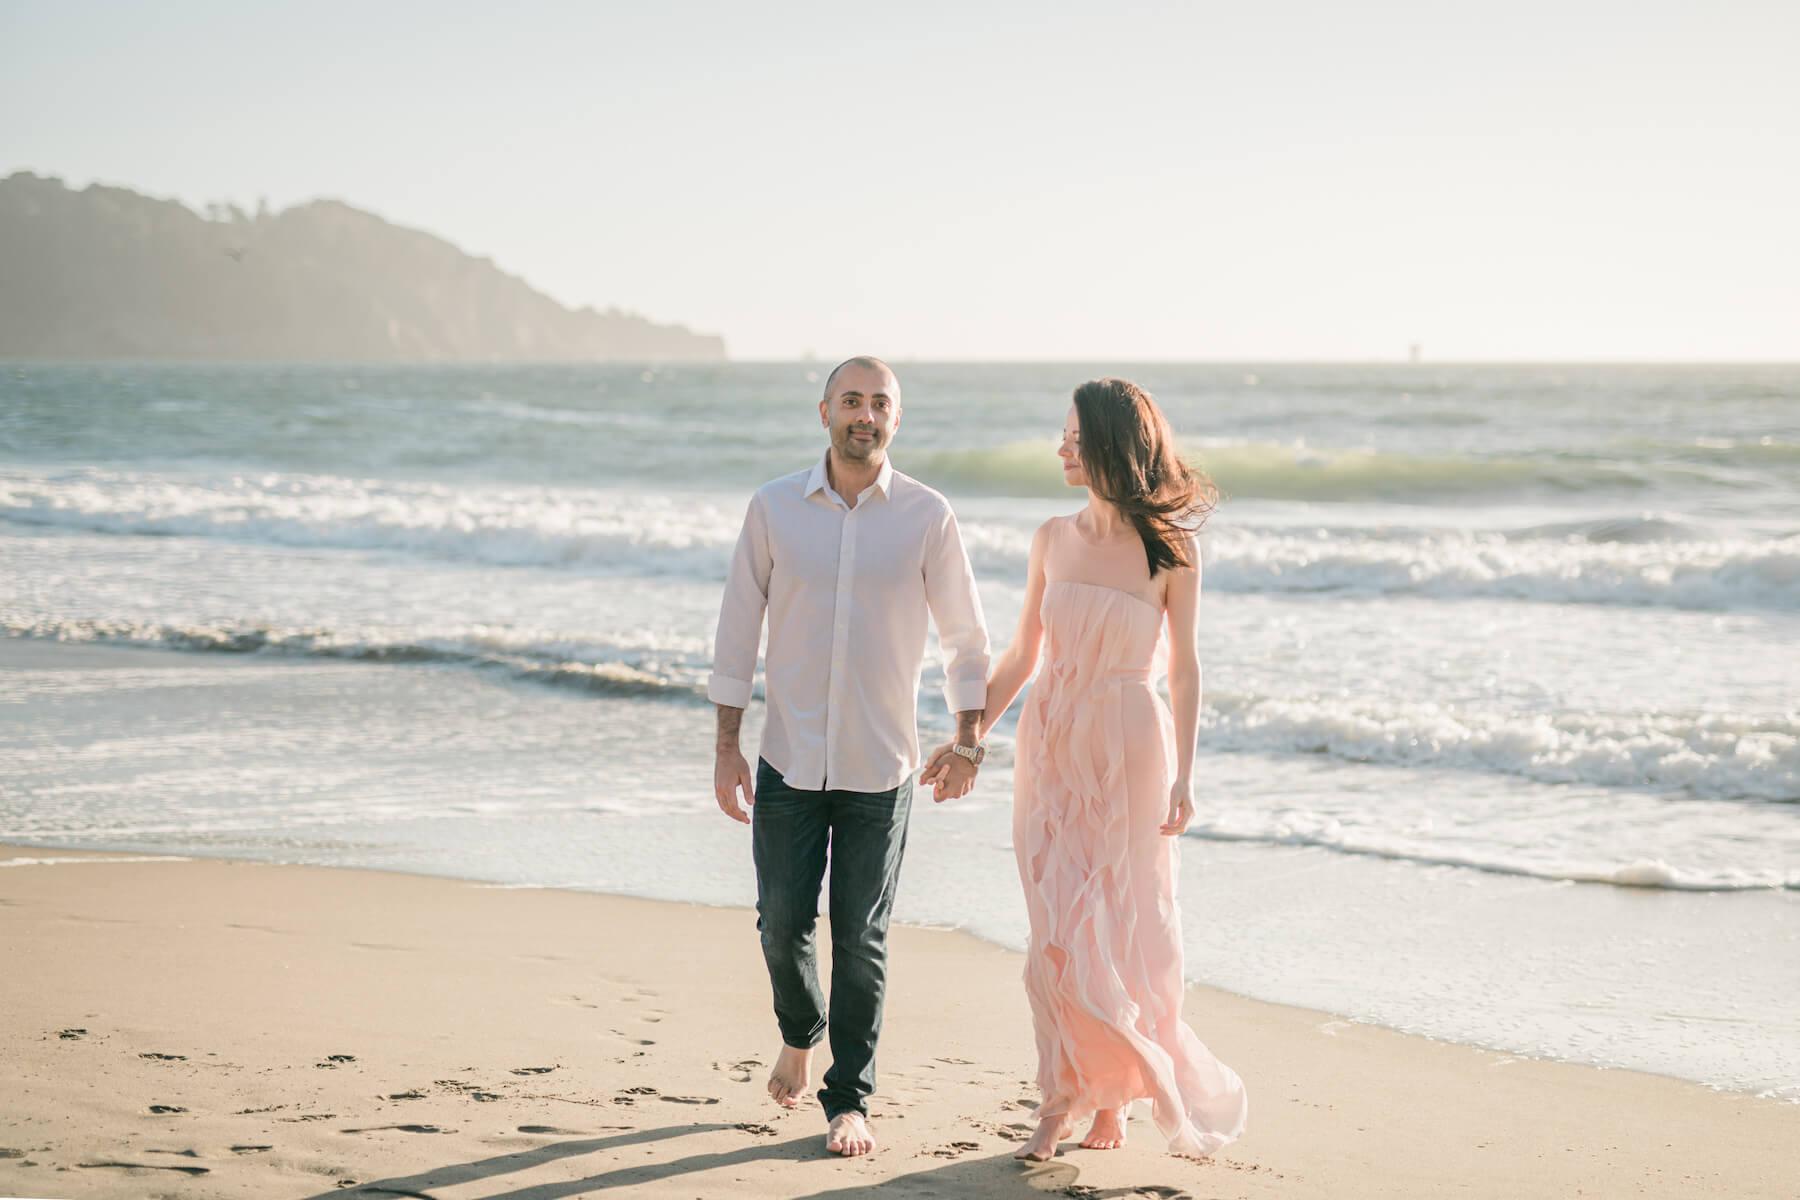 san-francisco-07-12-2020-couples-trip-37_original